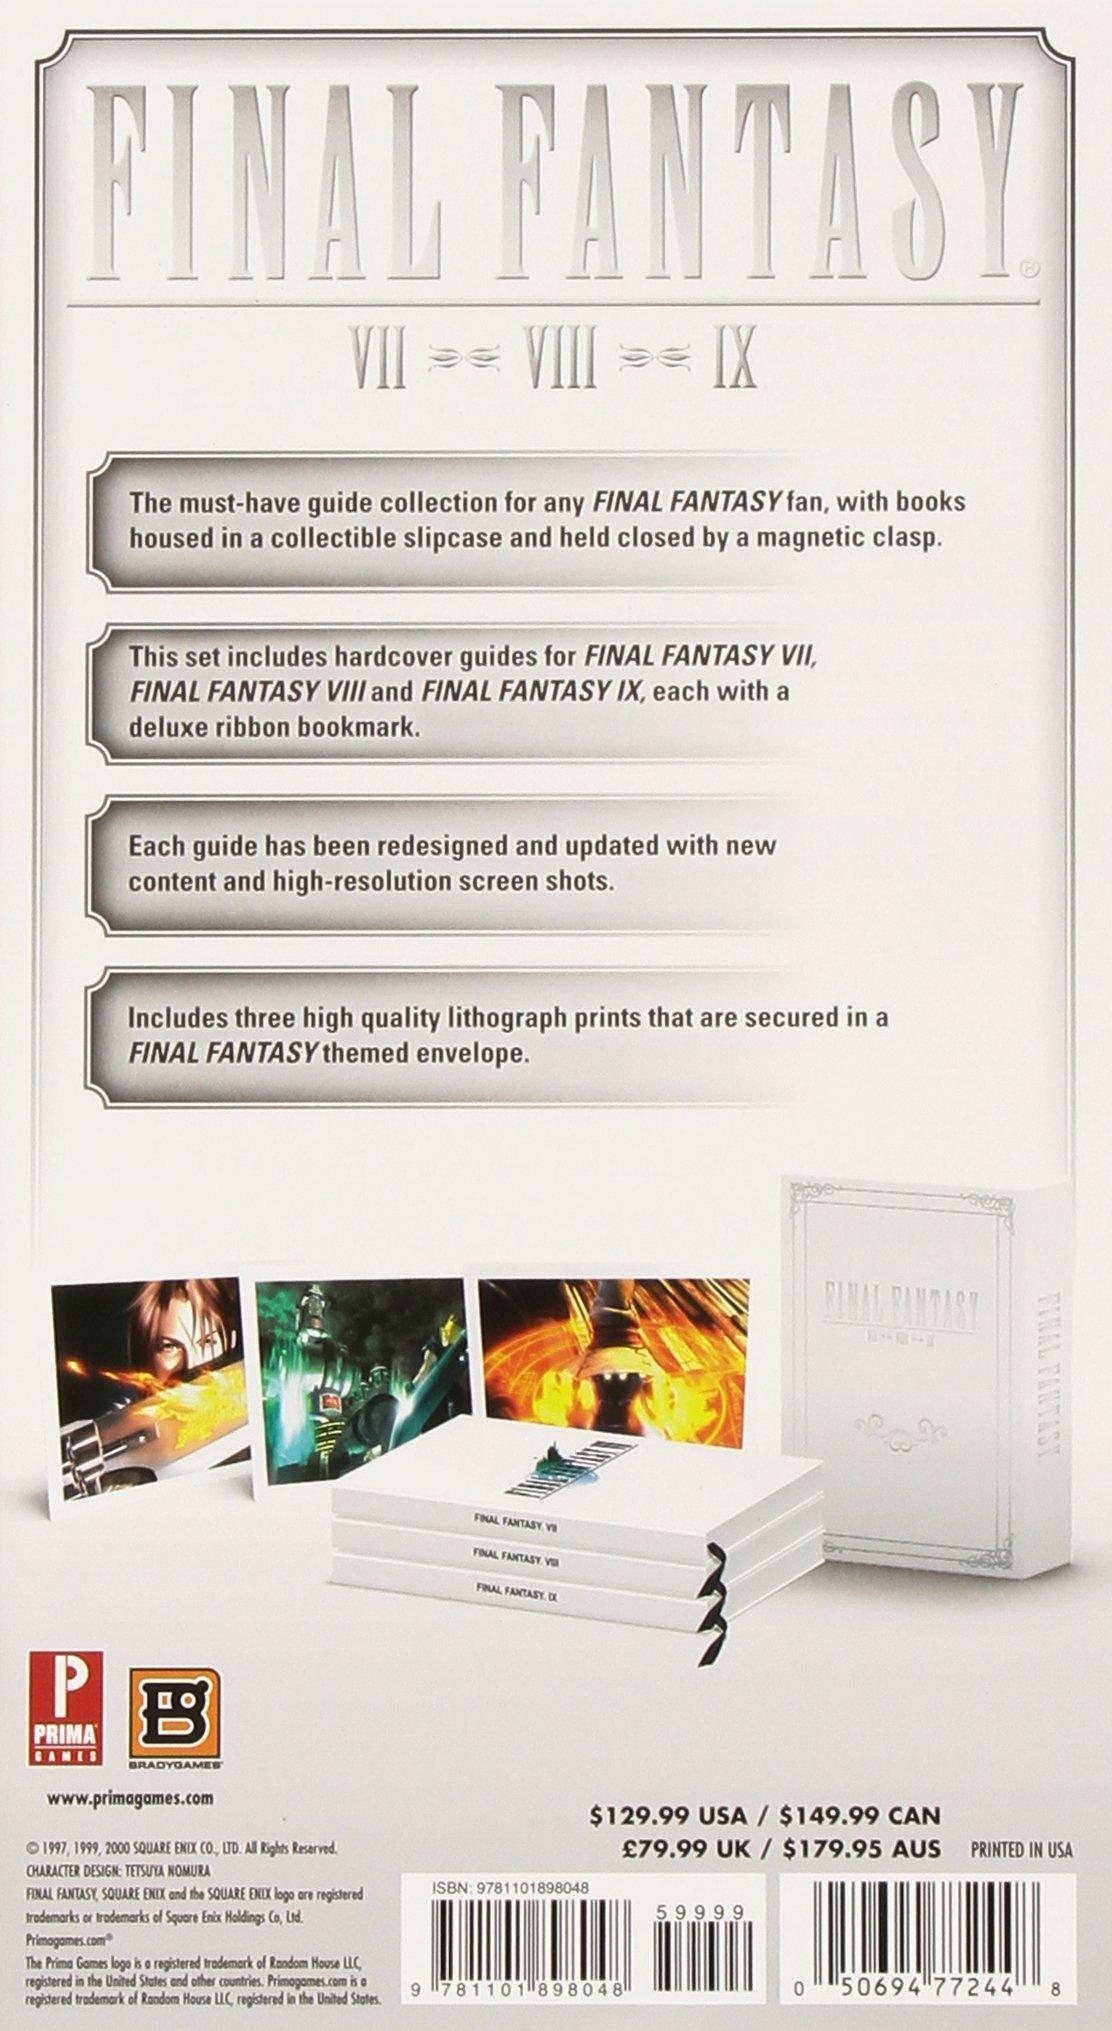 FINAL FANTASY Box Set (FFVII, FFVIII, FFIX): Prima Games